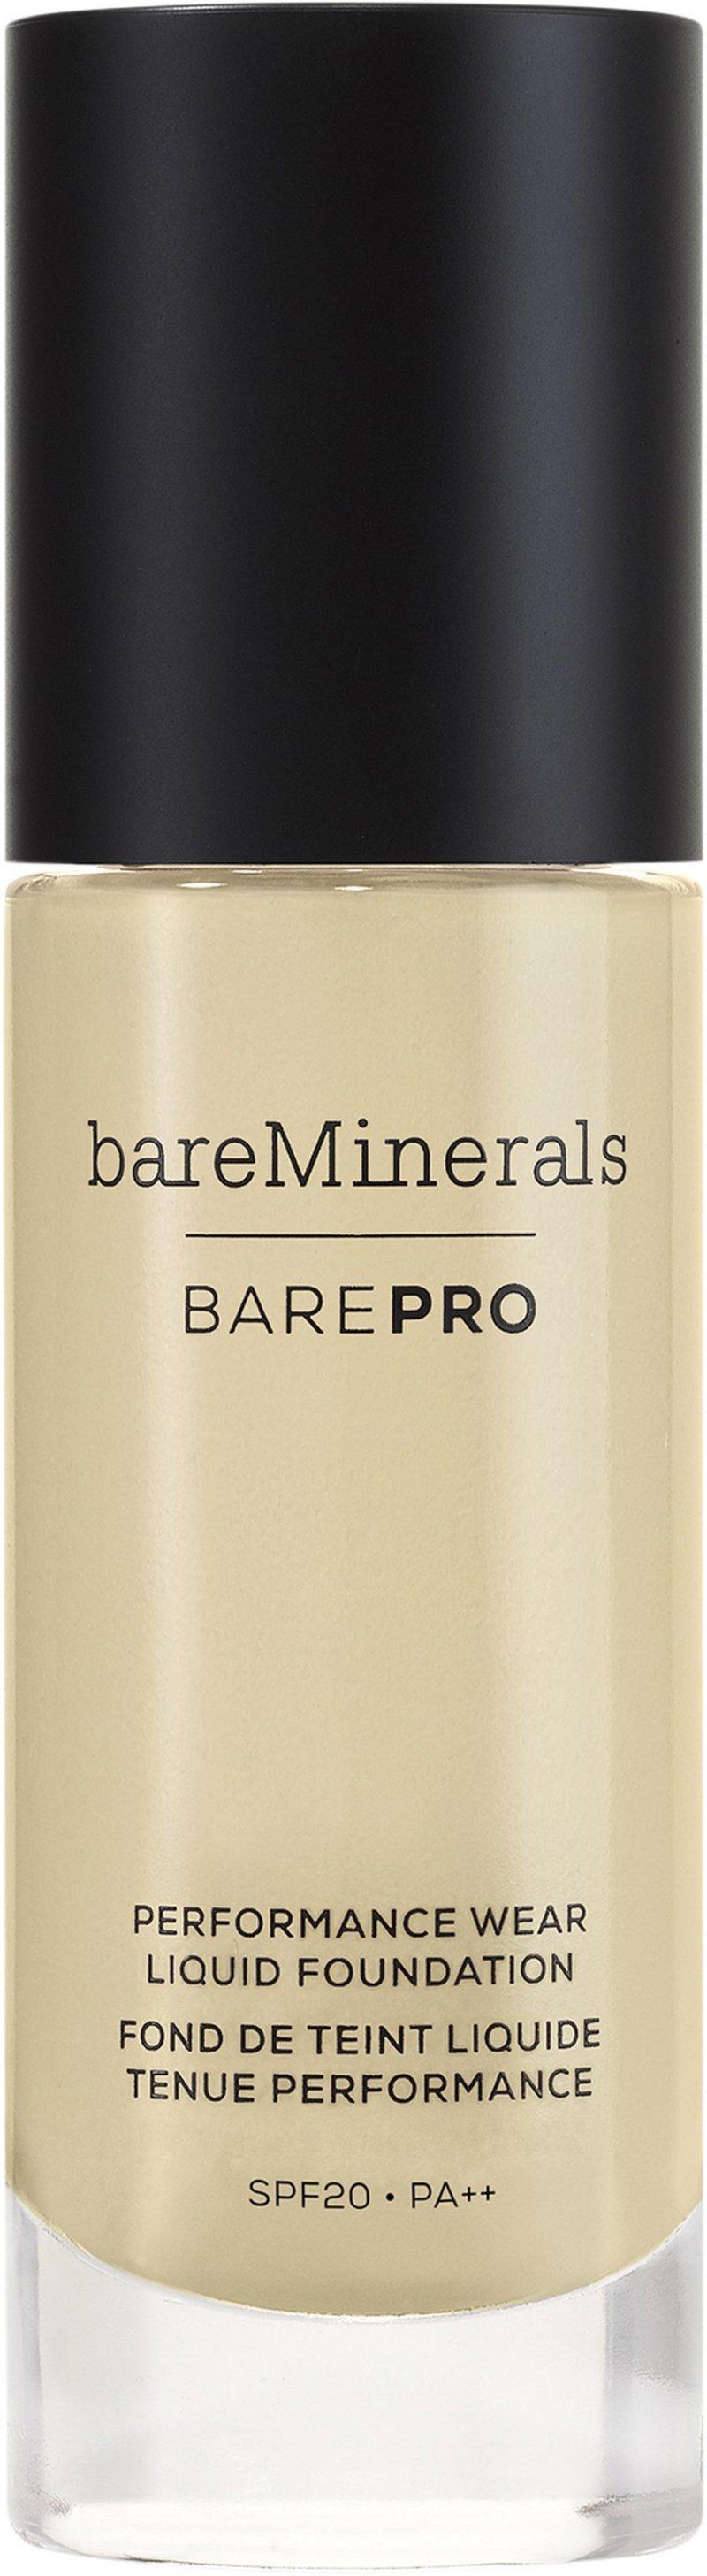 Image of   Bareminerals Foundation - Barepro Performance Wear Liquid - Warm Light 07